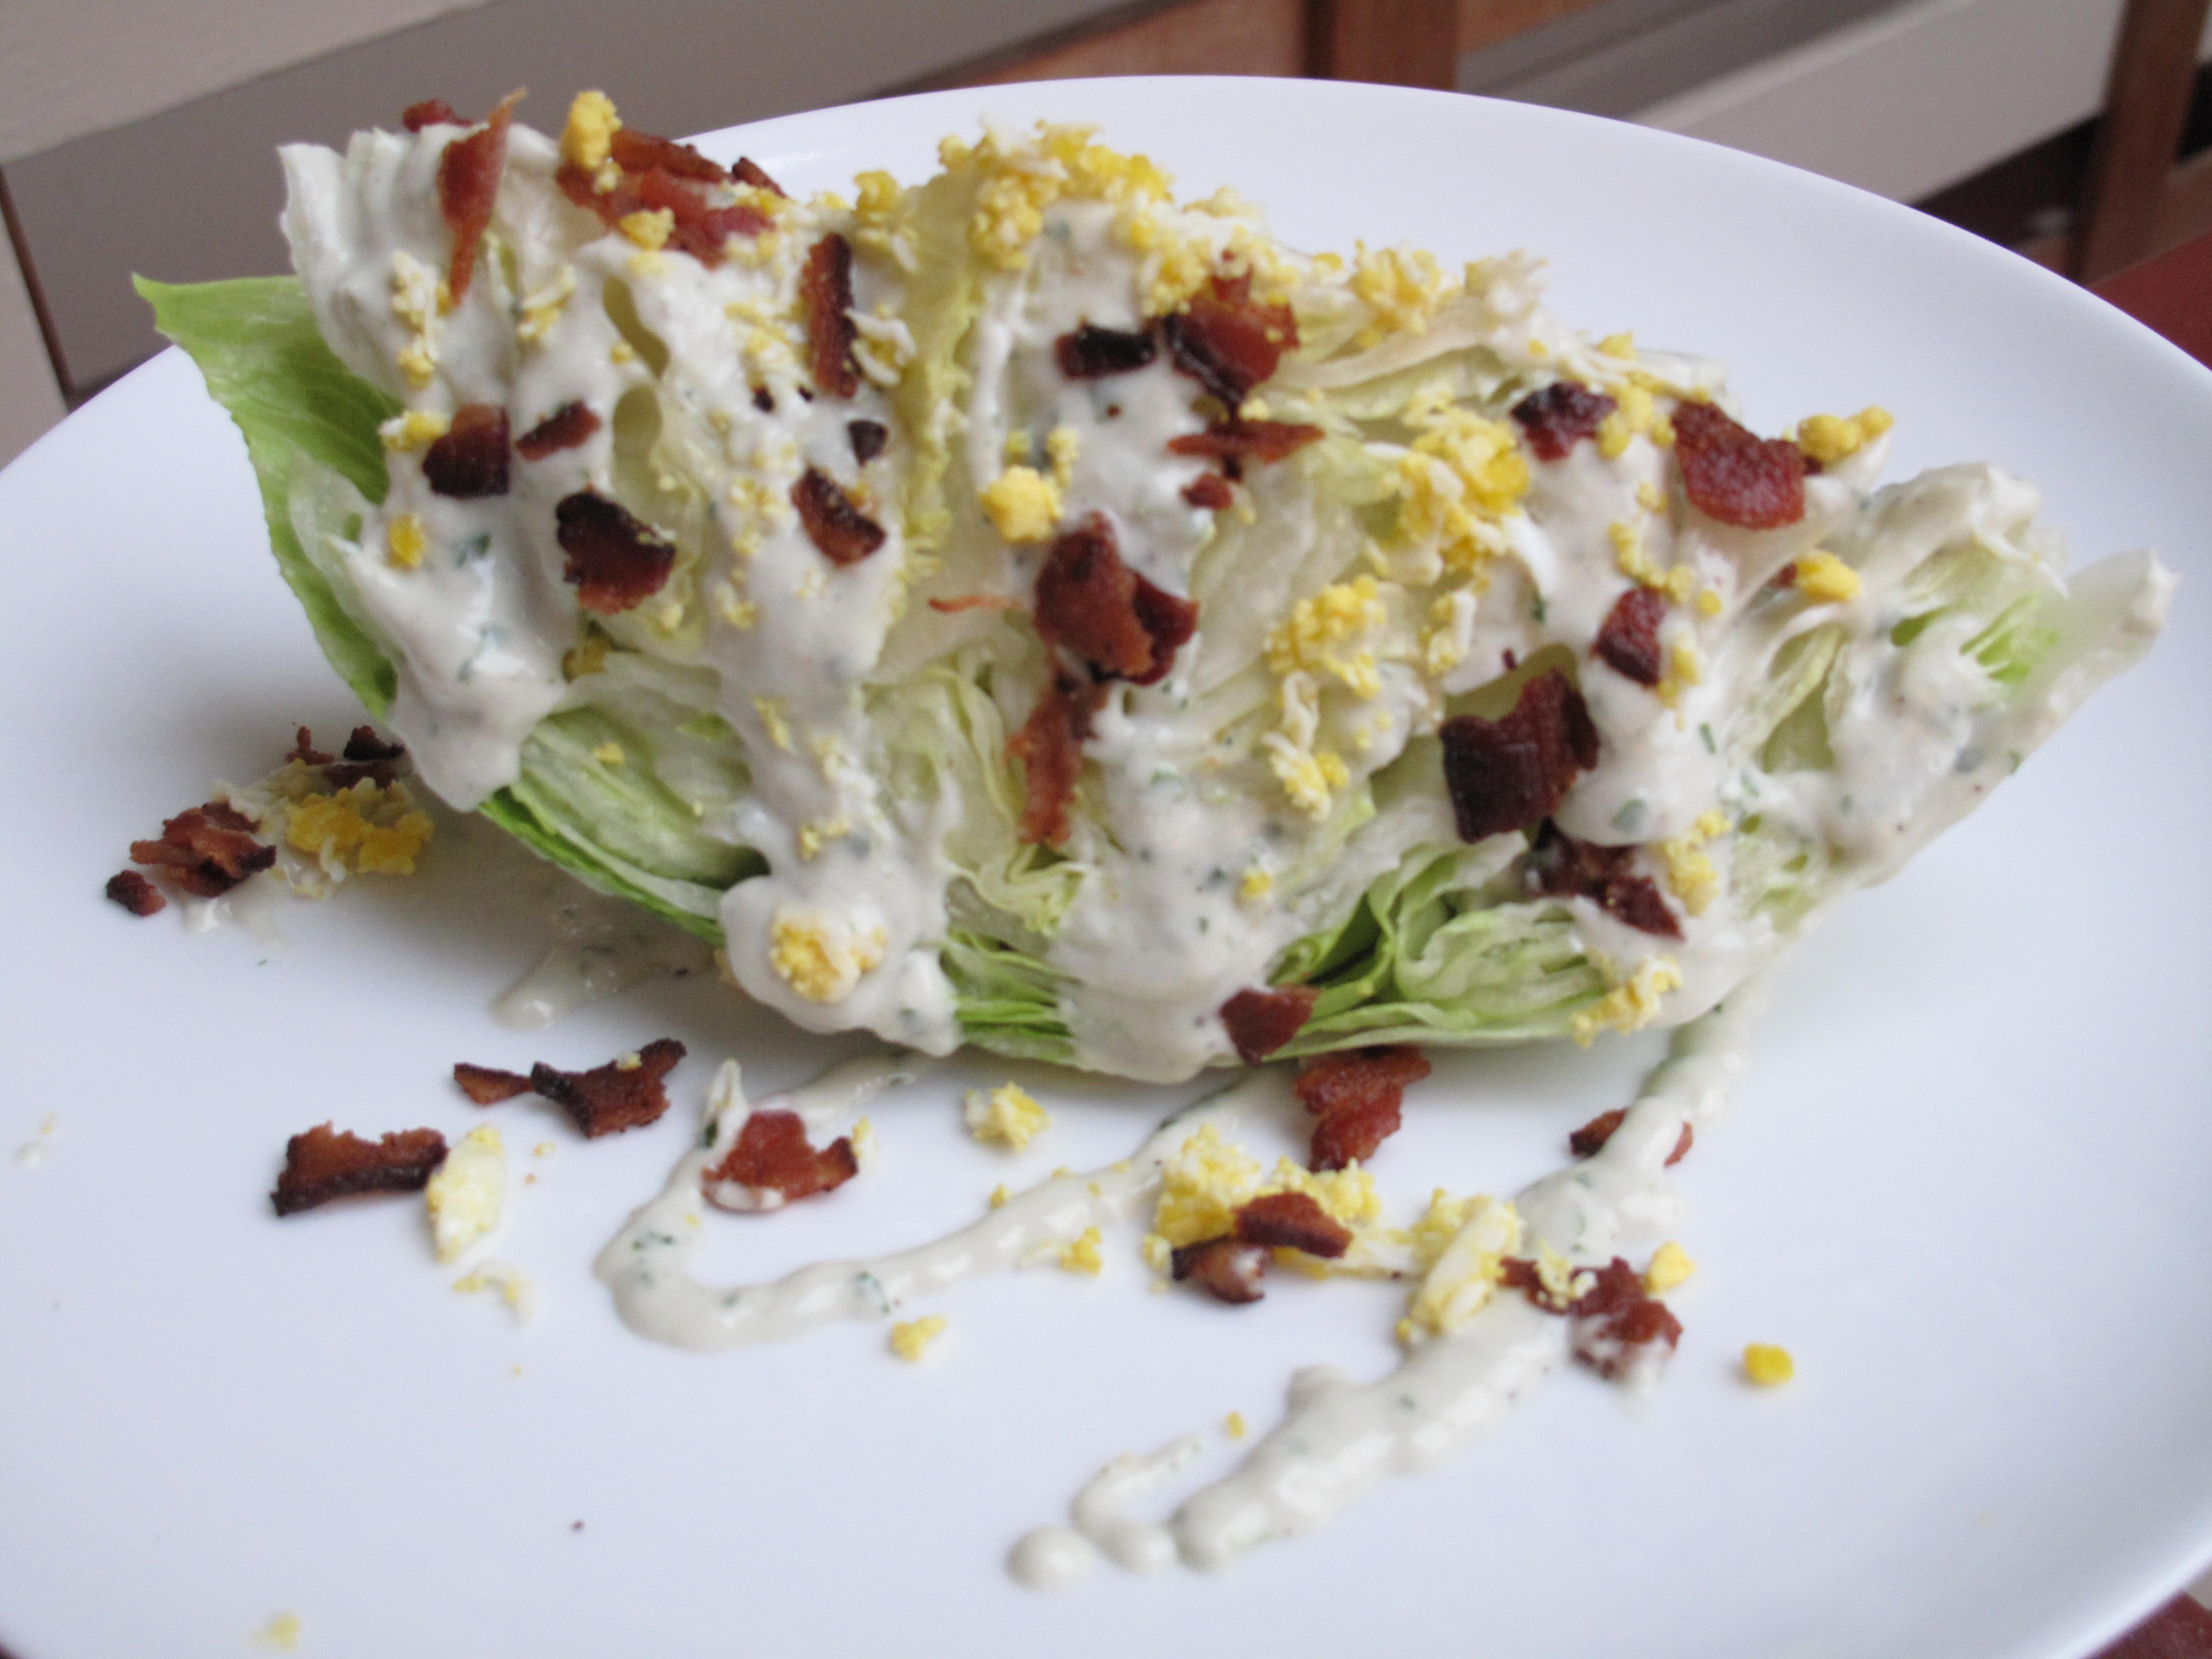 Photos of Wedge Salad